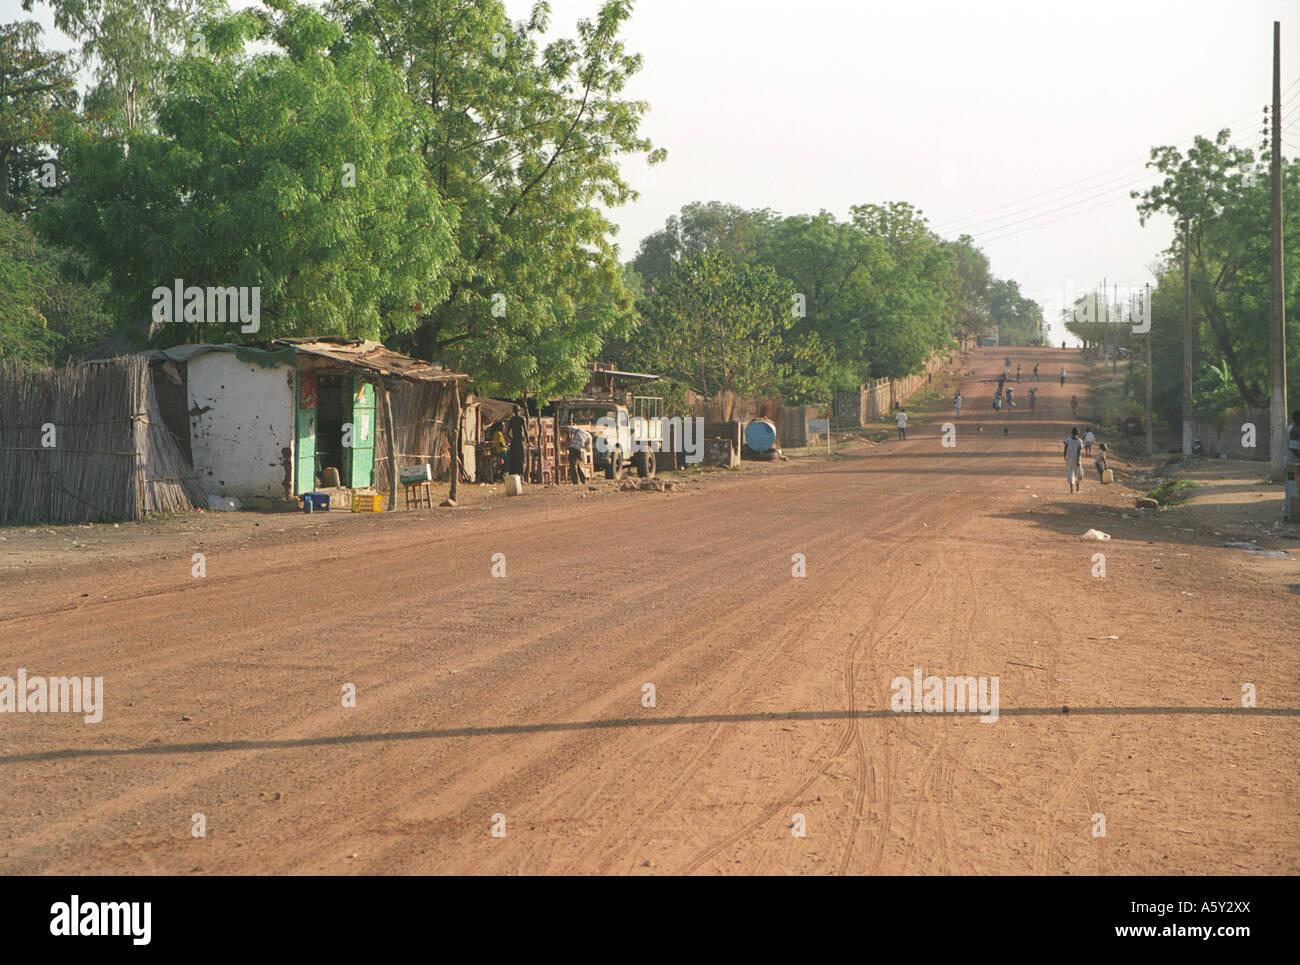 Steet of Juba, South Sudan - Stock Image